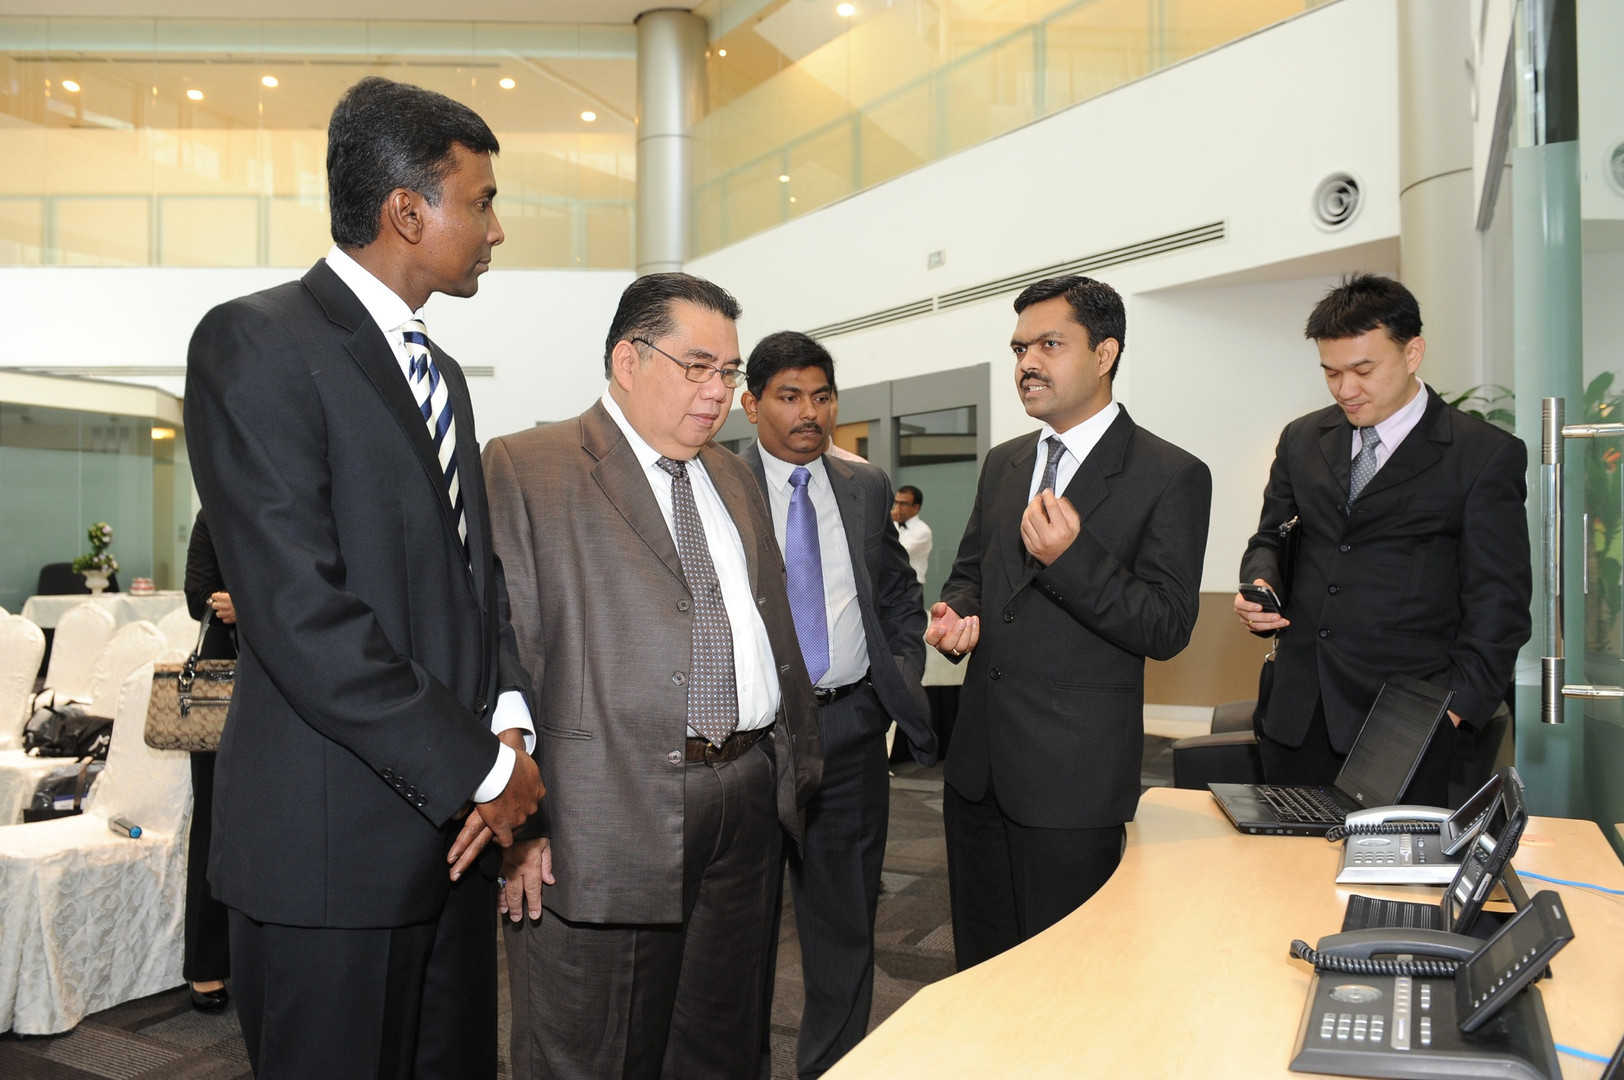 Mr Rahul Kulkarni, Head of Product and B